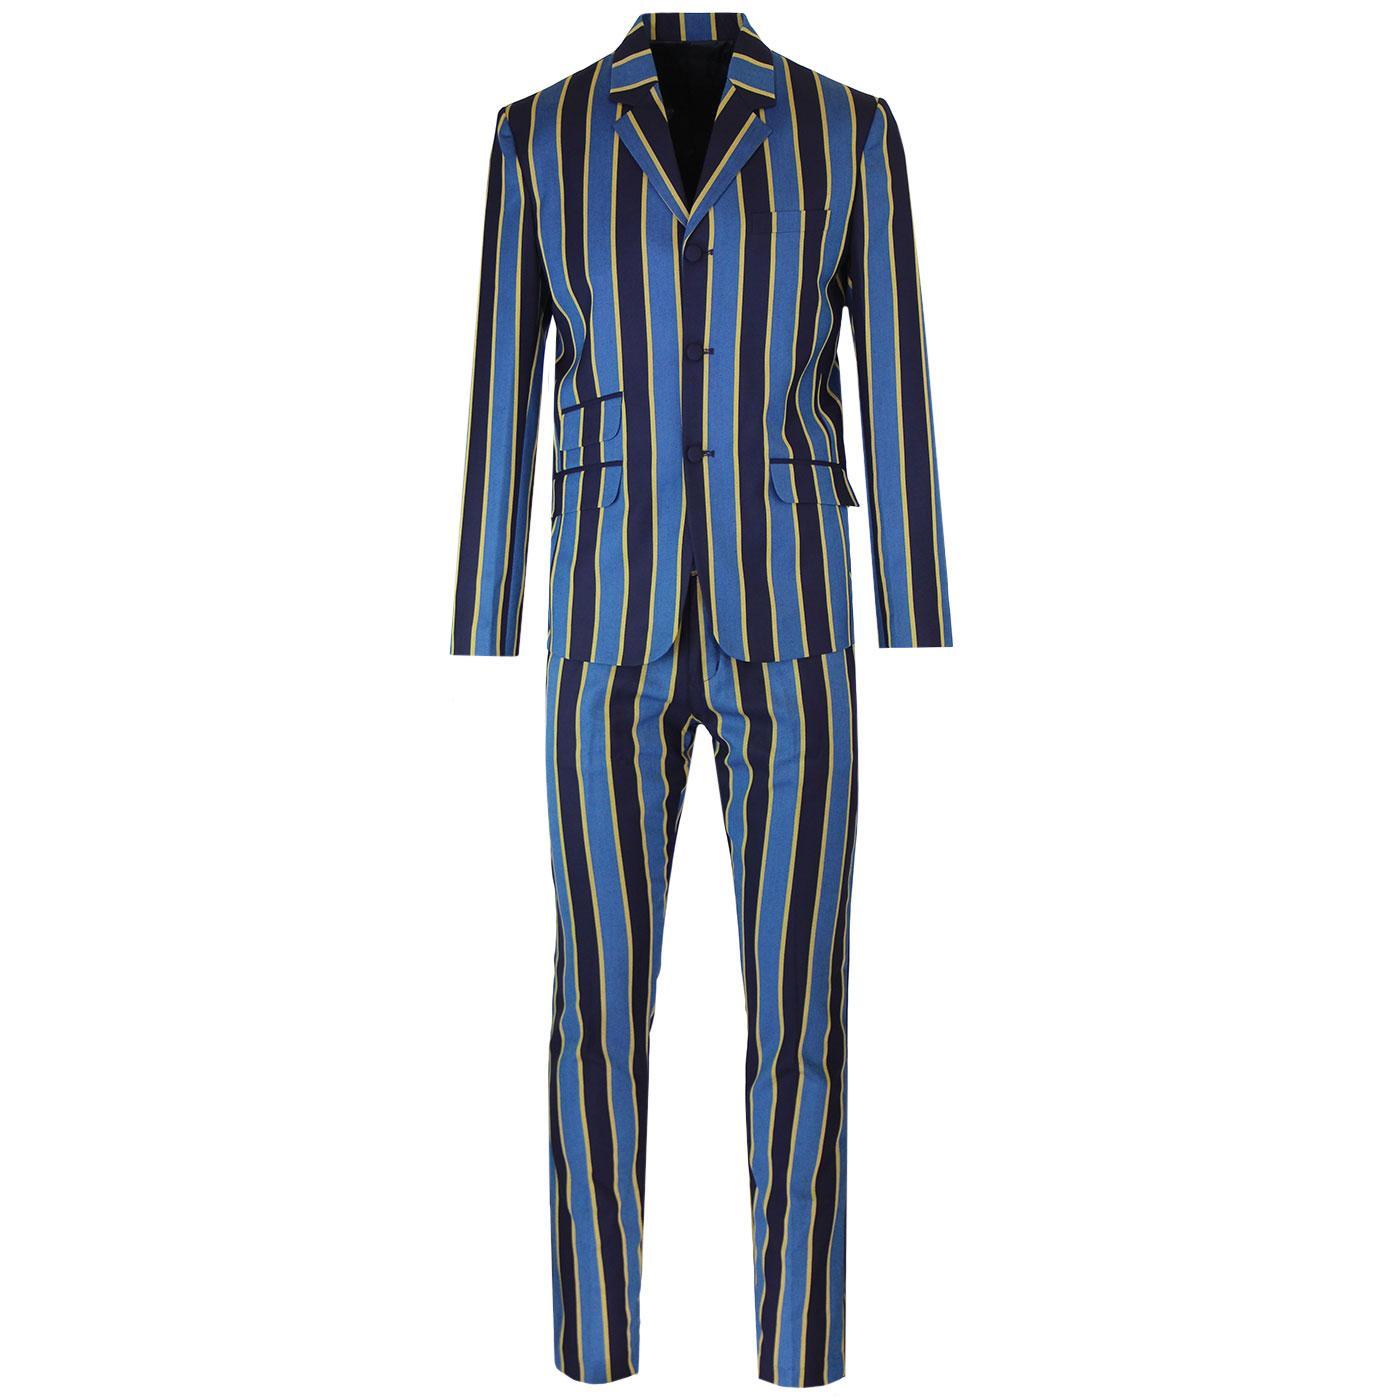 Offbeat MADCAP ENGLAND Mod Striped Slim Leg Suit